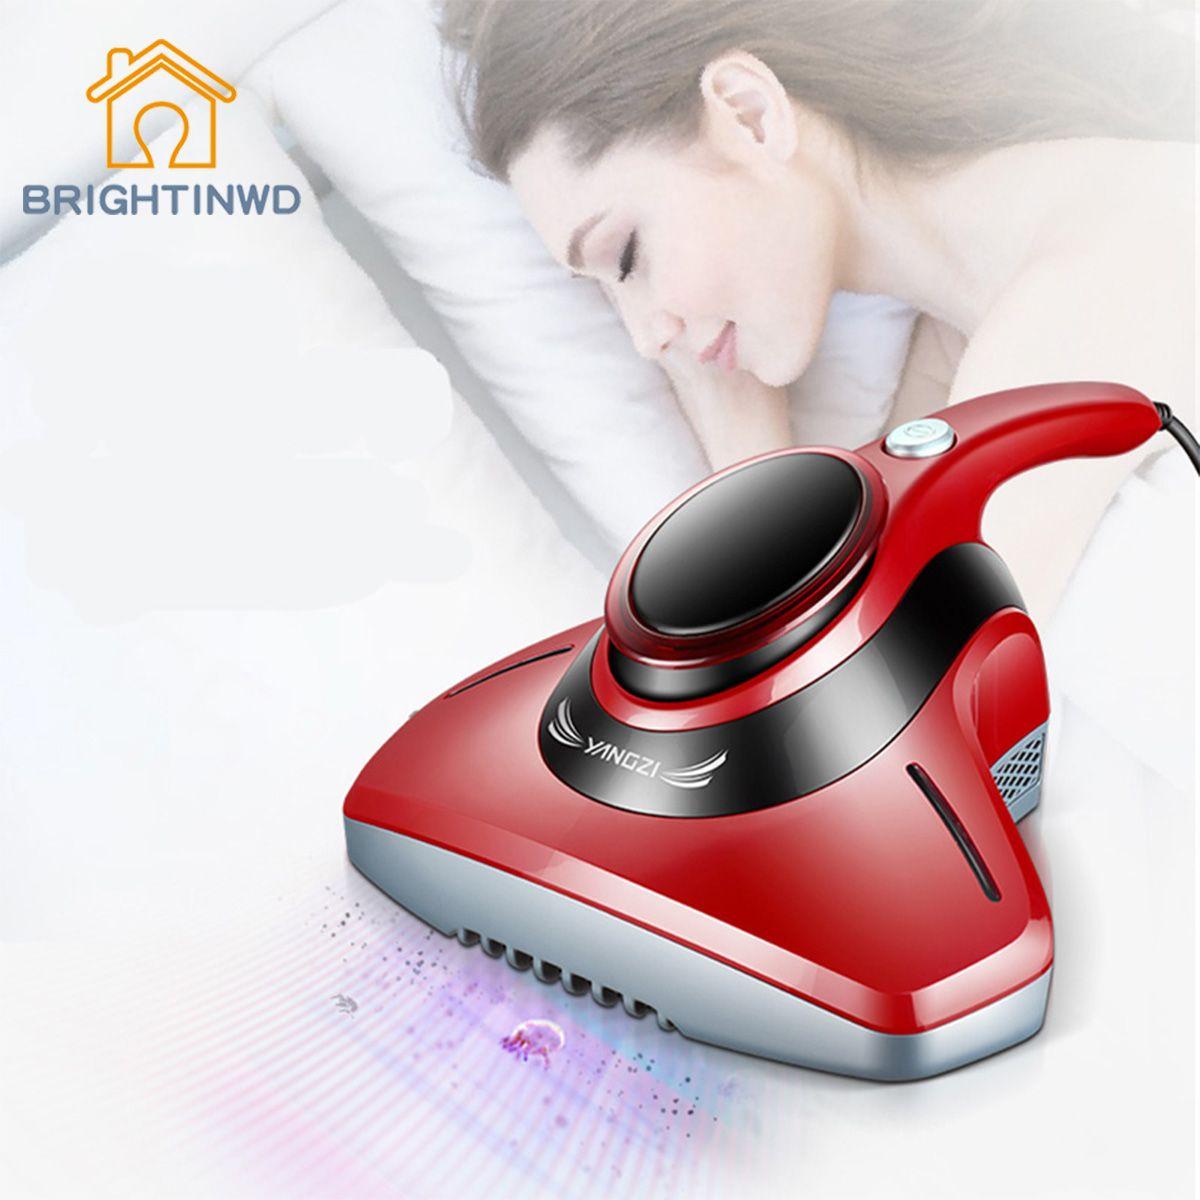 BRIGHTINWD UV Lamp Mite Bed Sterilization Machine In Addition To Mites Vacuum Cleaner Small Mini Dust